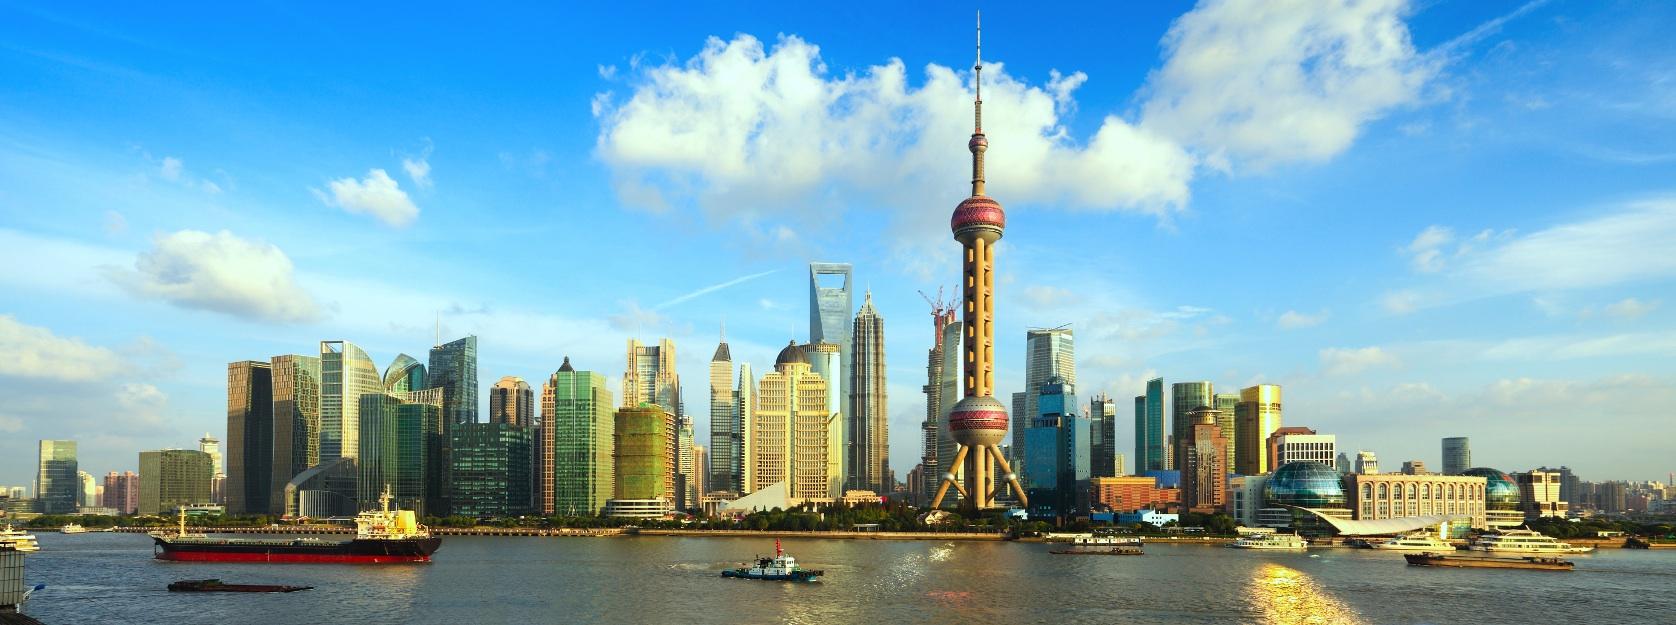 Languatics-Language-Immersion-Mandarin-Shanghai-China